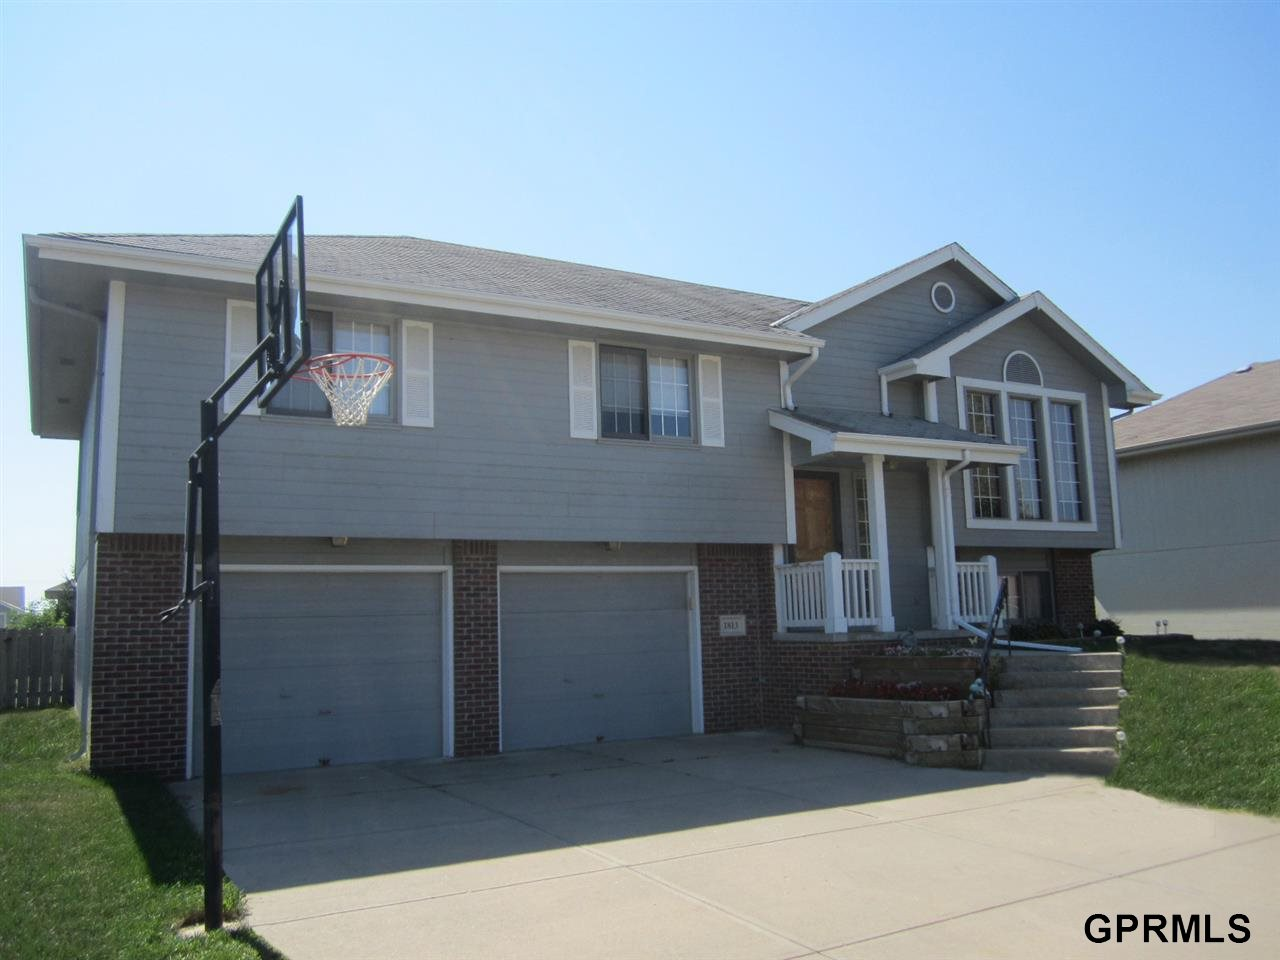 Rental Homes for Rent, ListingId:30859327, location: 1813 Savannah Papillion 68133